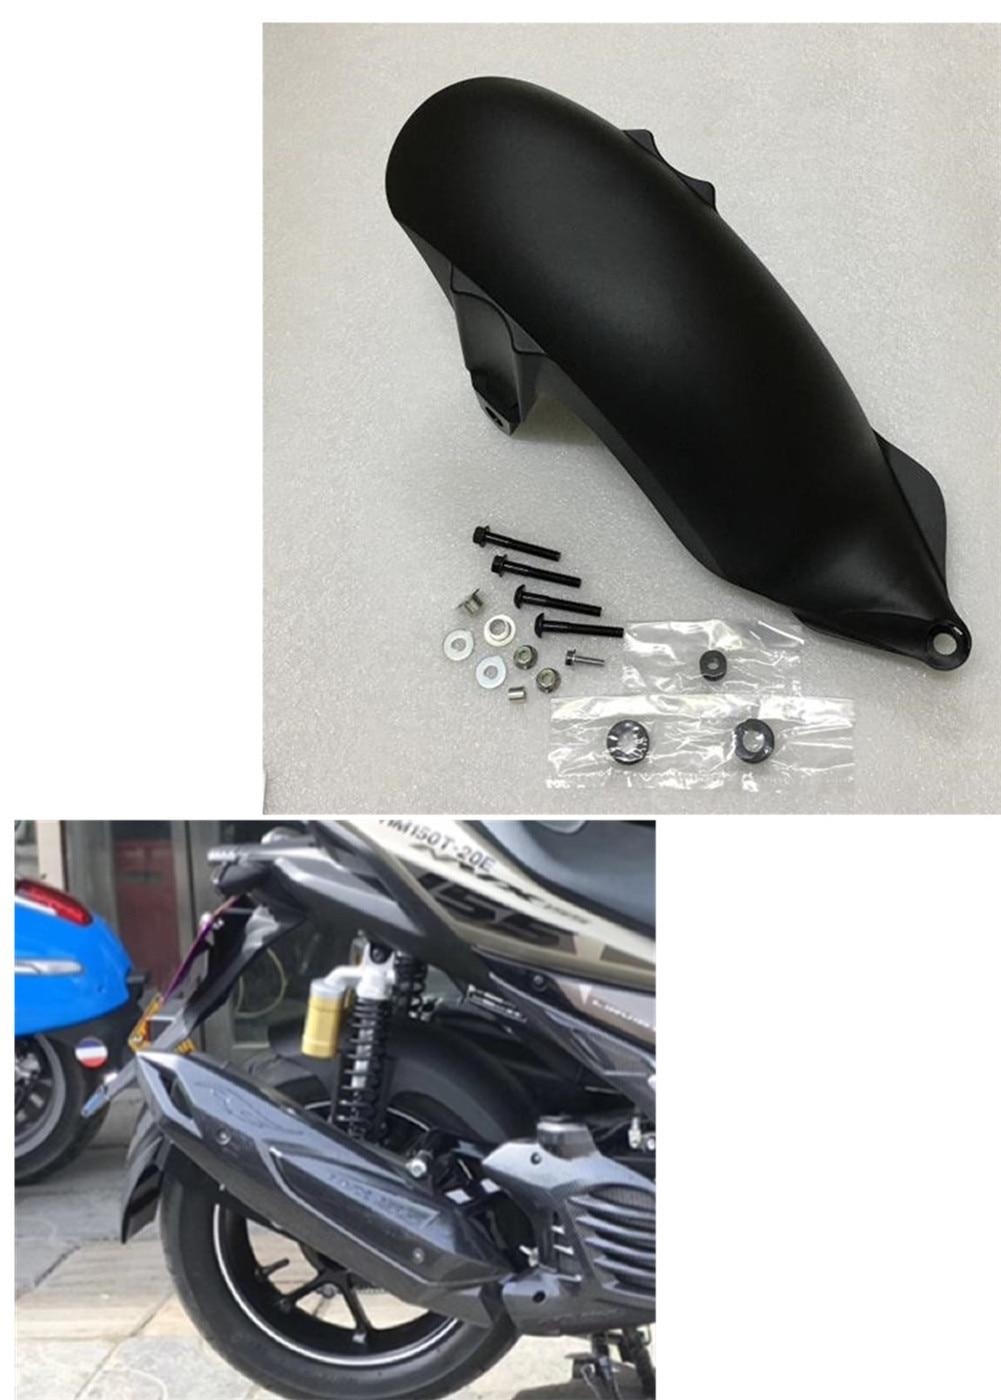 Motorcycle Rear Mudguard Fender For YAMAHA AEROX 155 NVX155 NVX 155 2017 2018